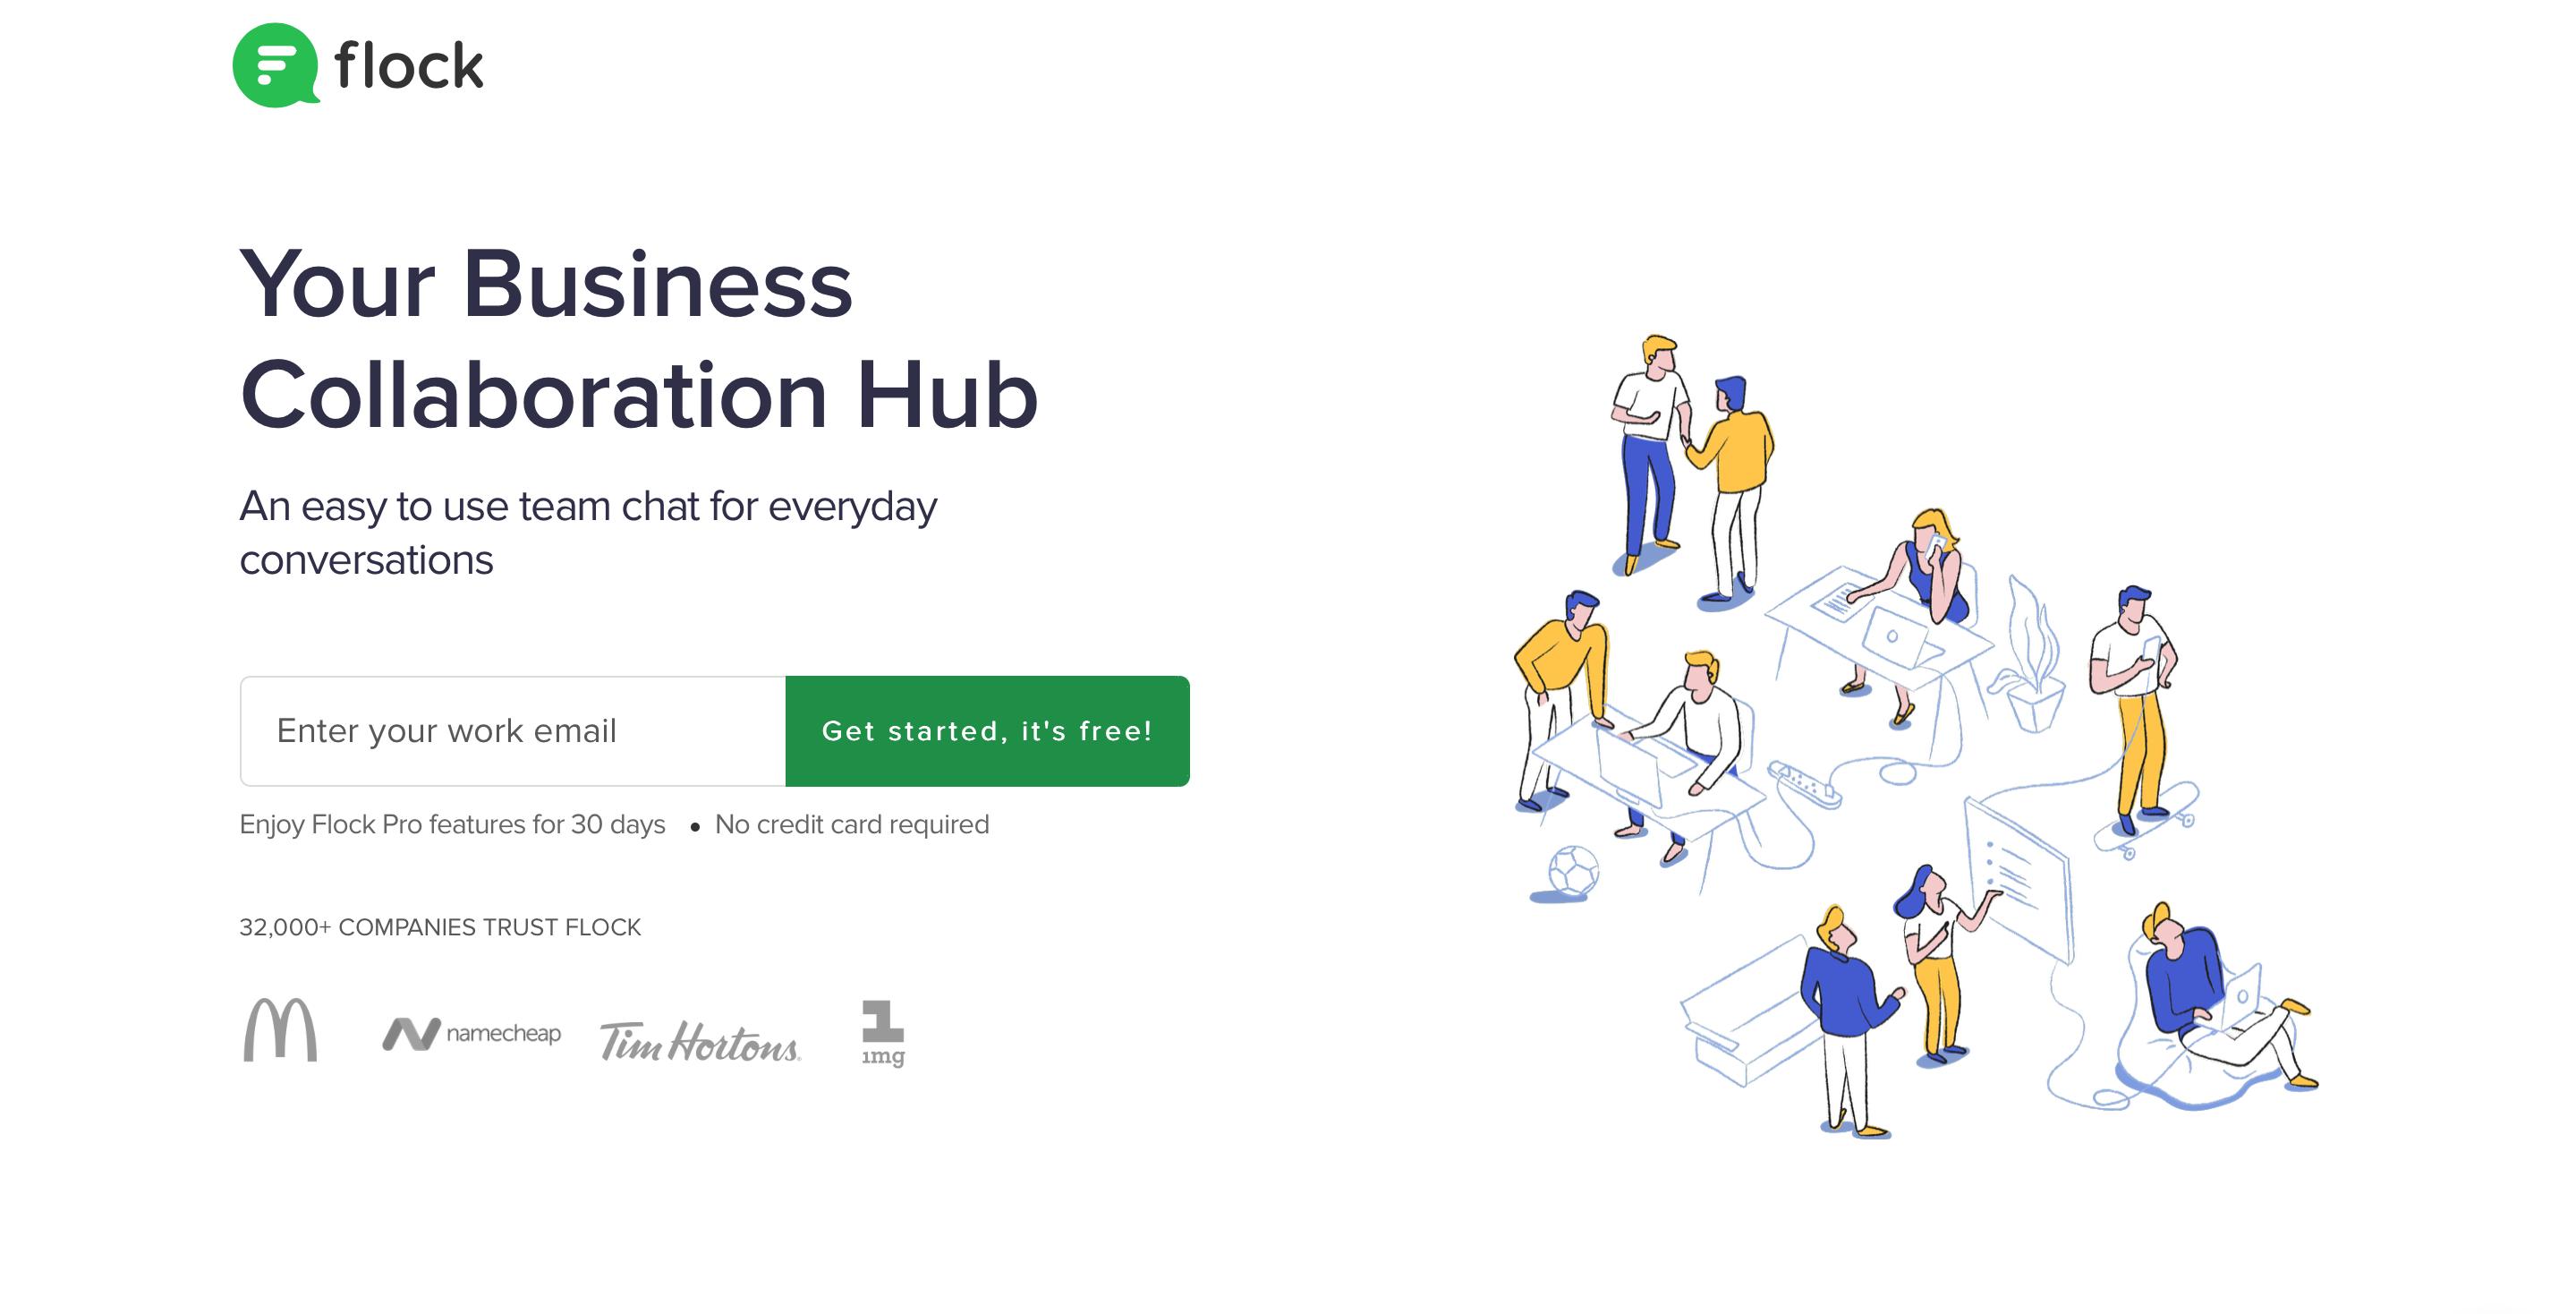 flock business collaboration hub